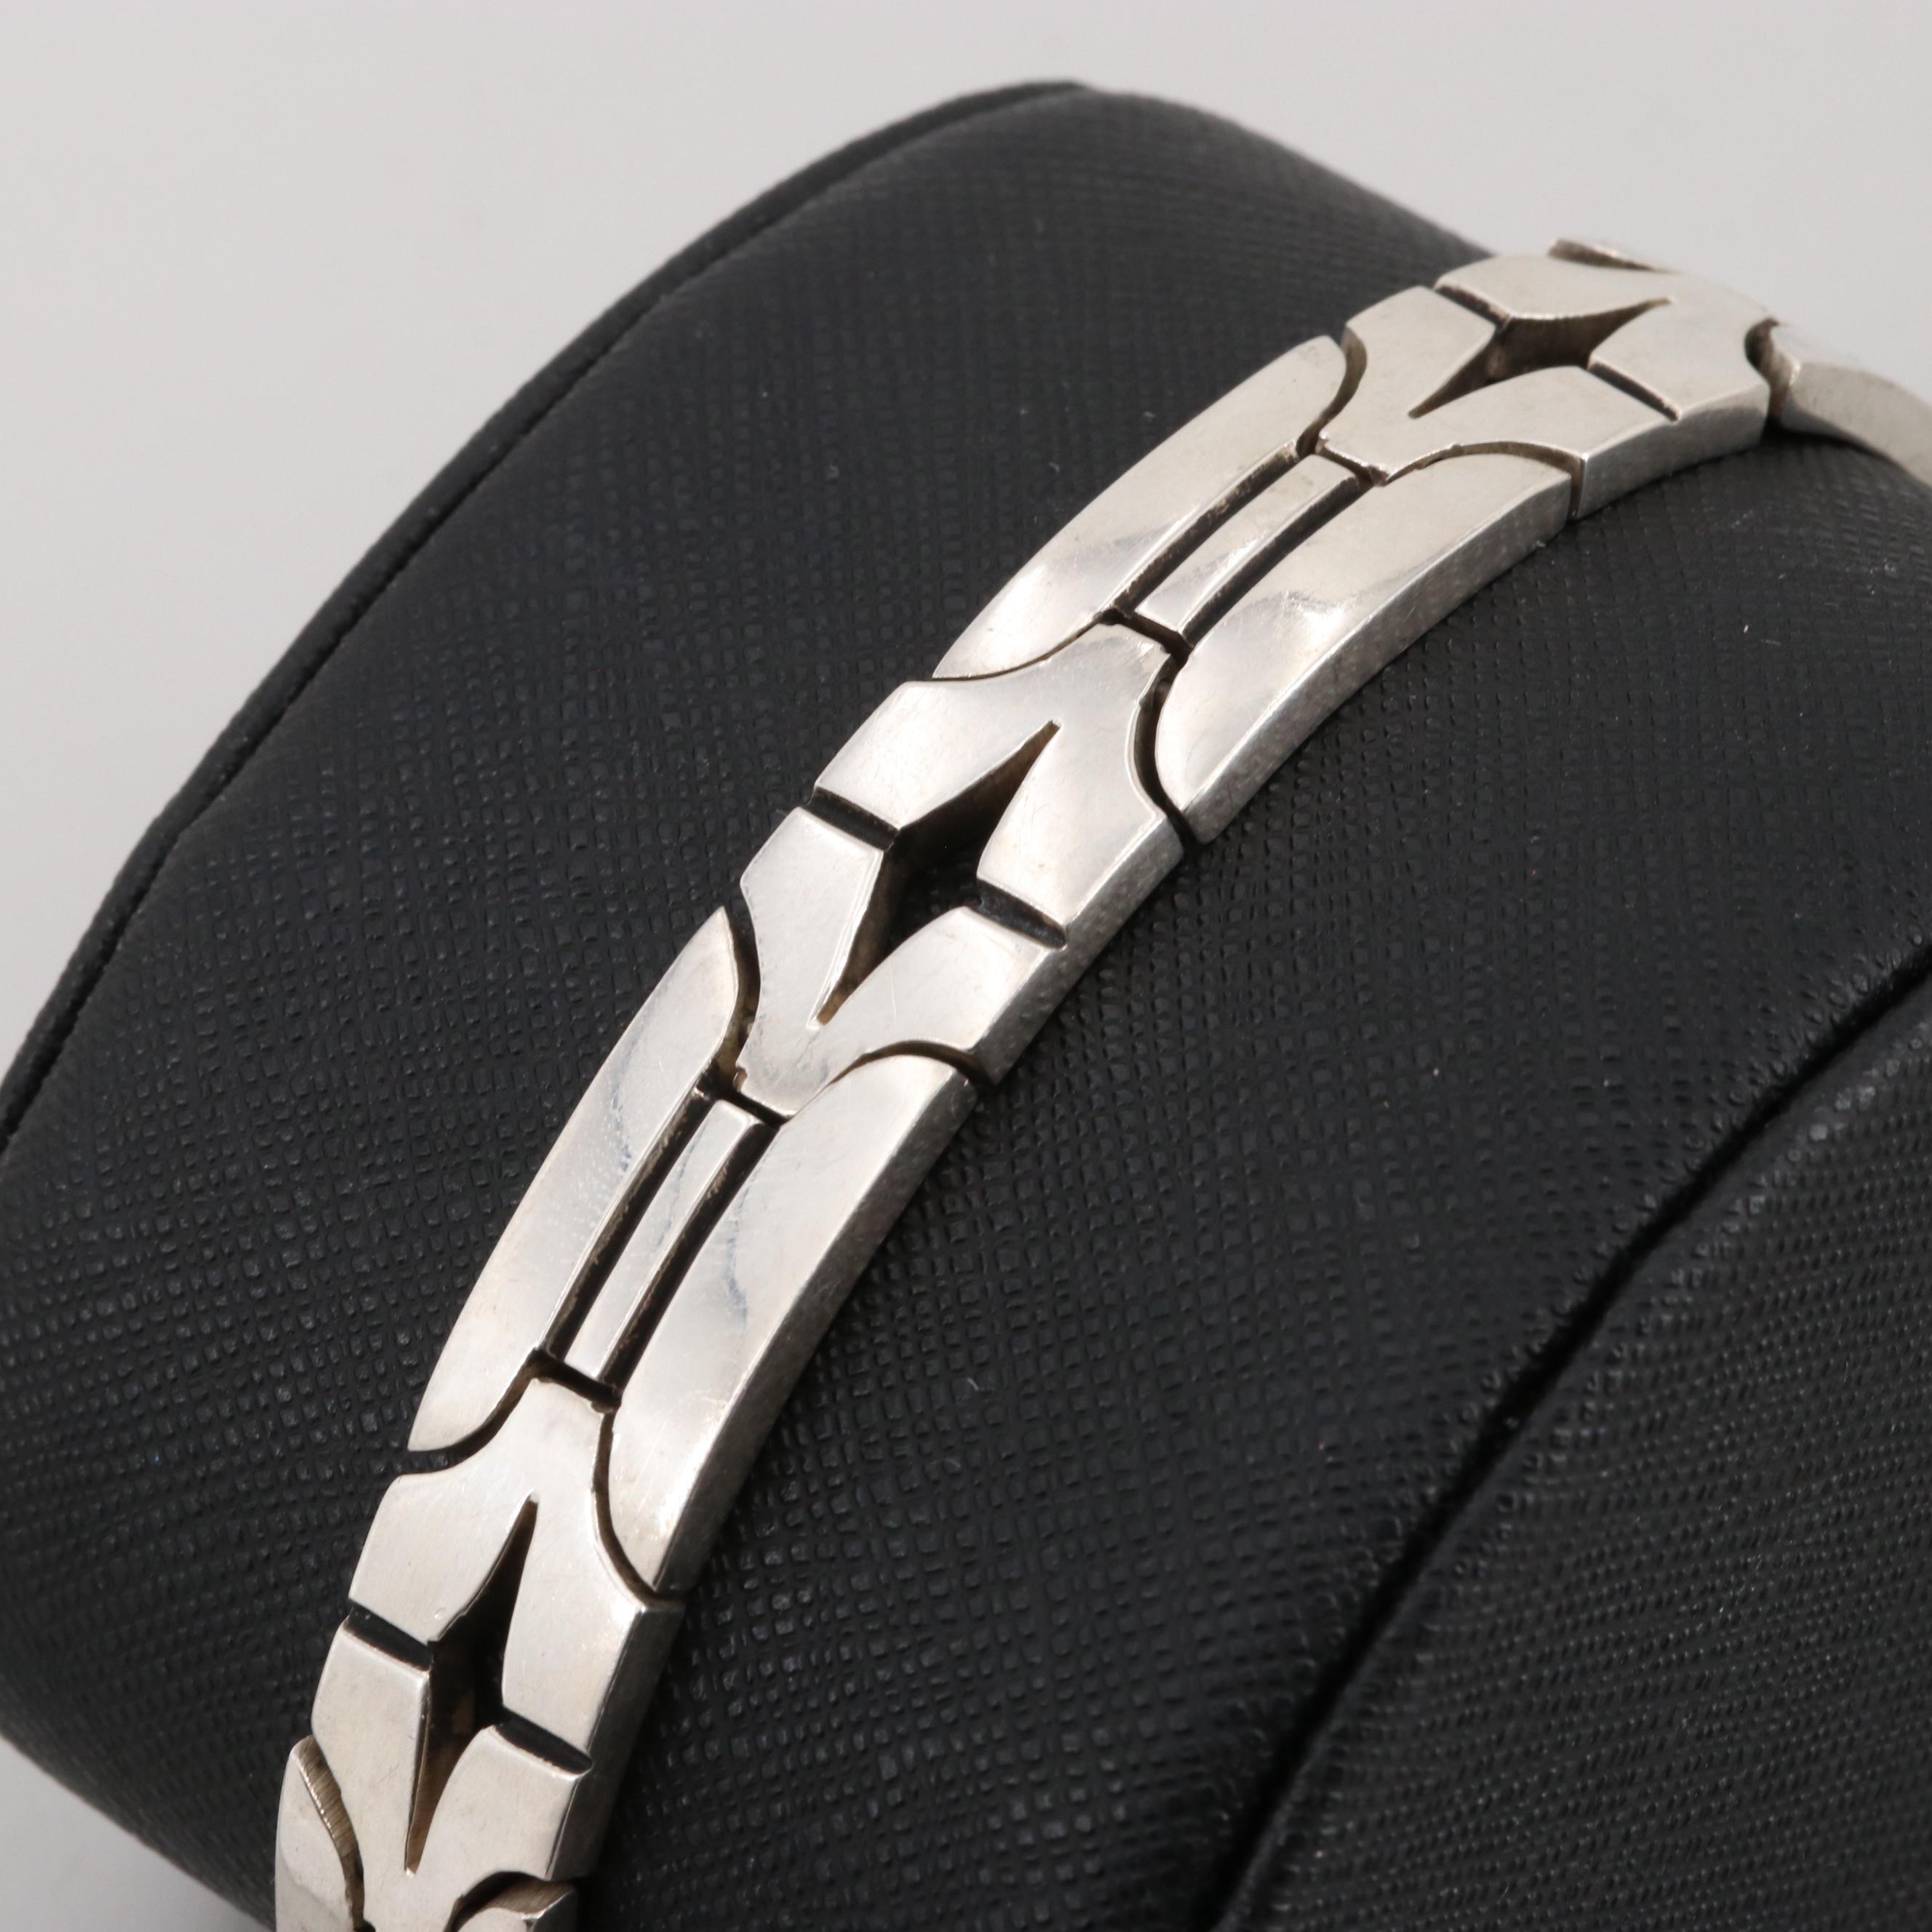 Vintage Taxco Mexico Sterling Silver Link Bracelet